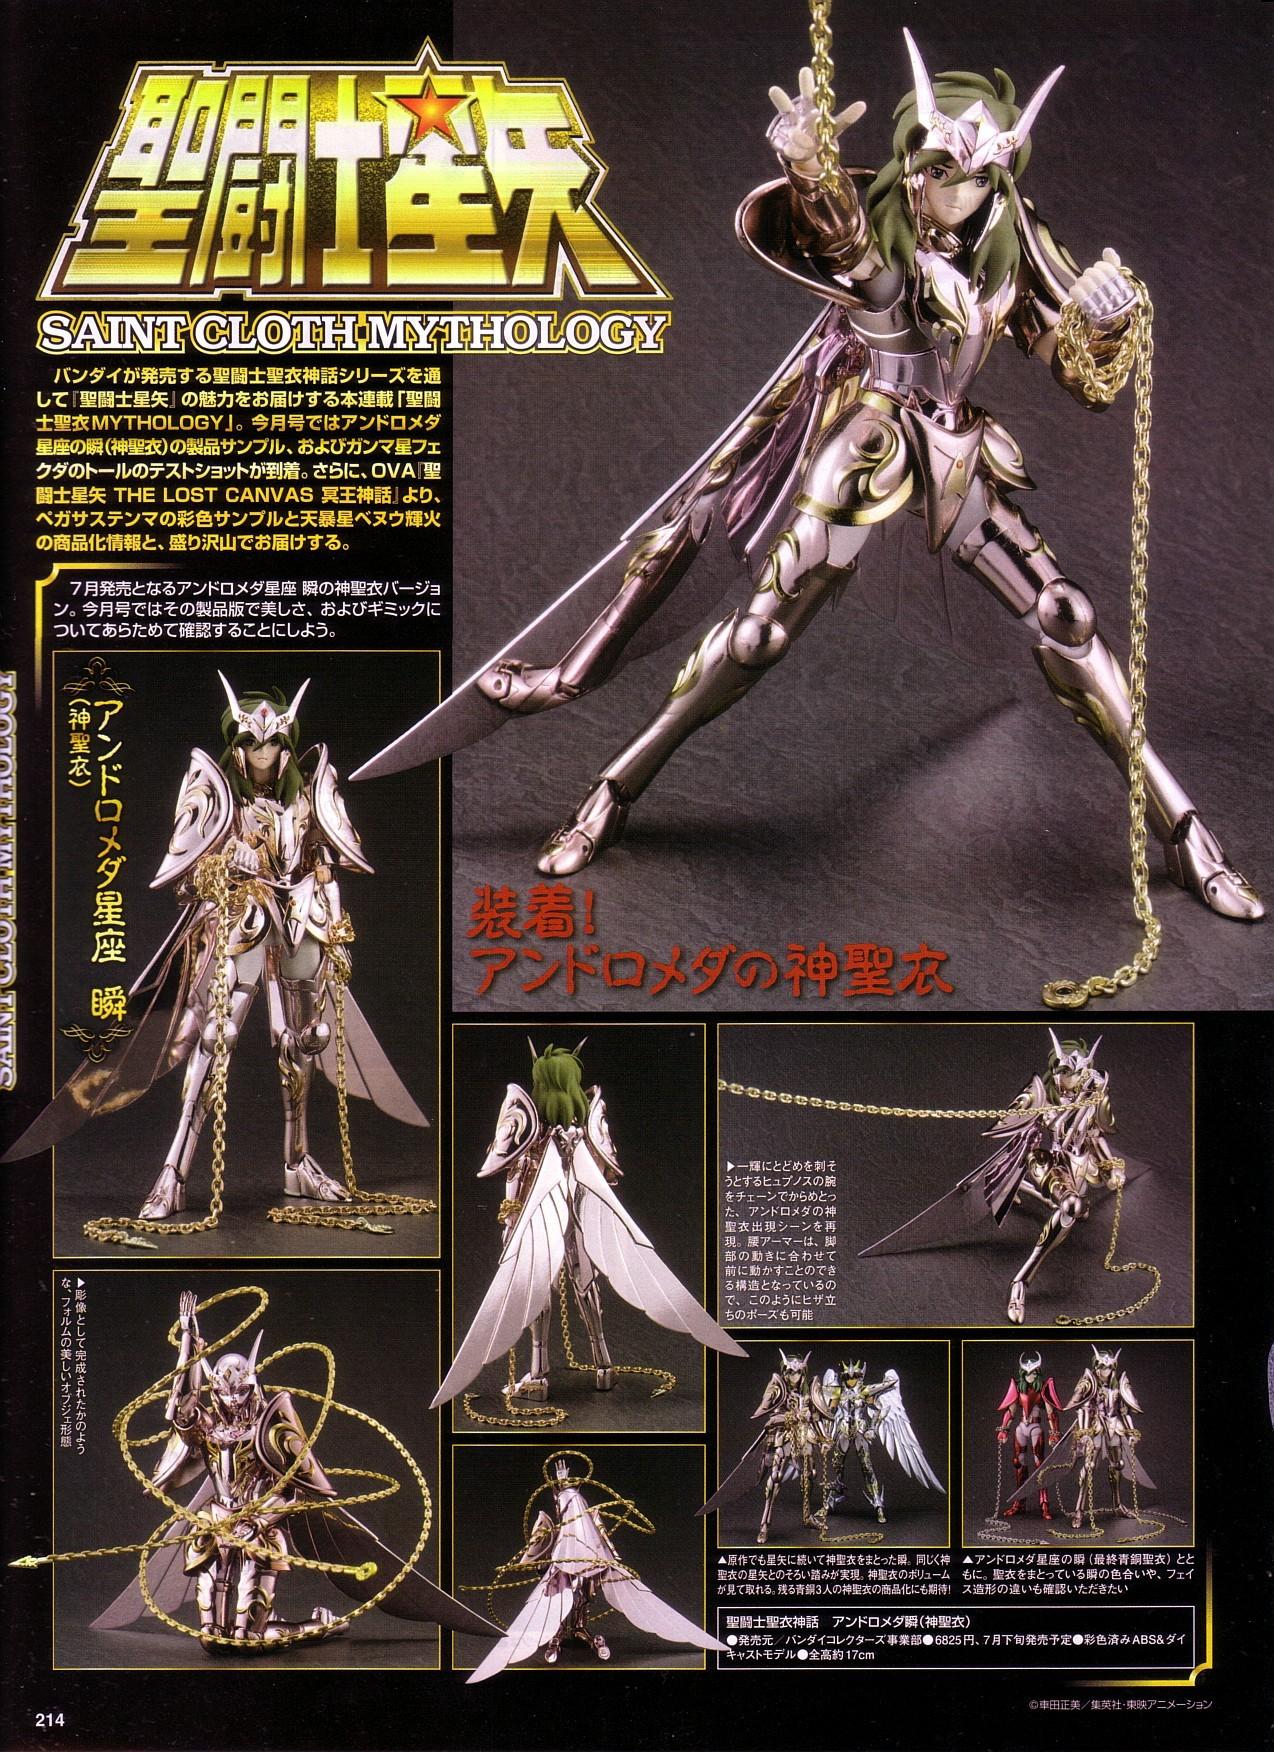 04 - Shun d'Andromède God Cloth HobbyJapan-02